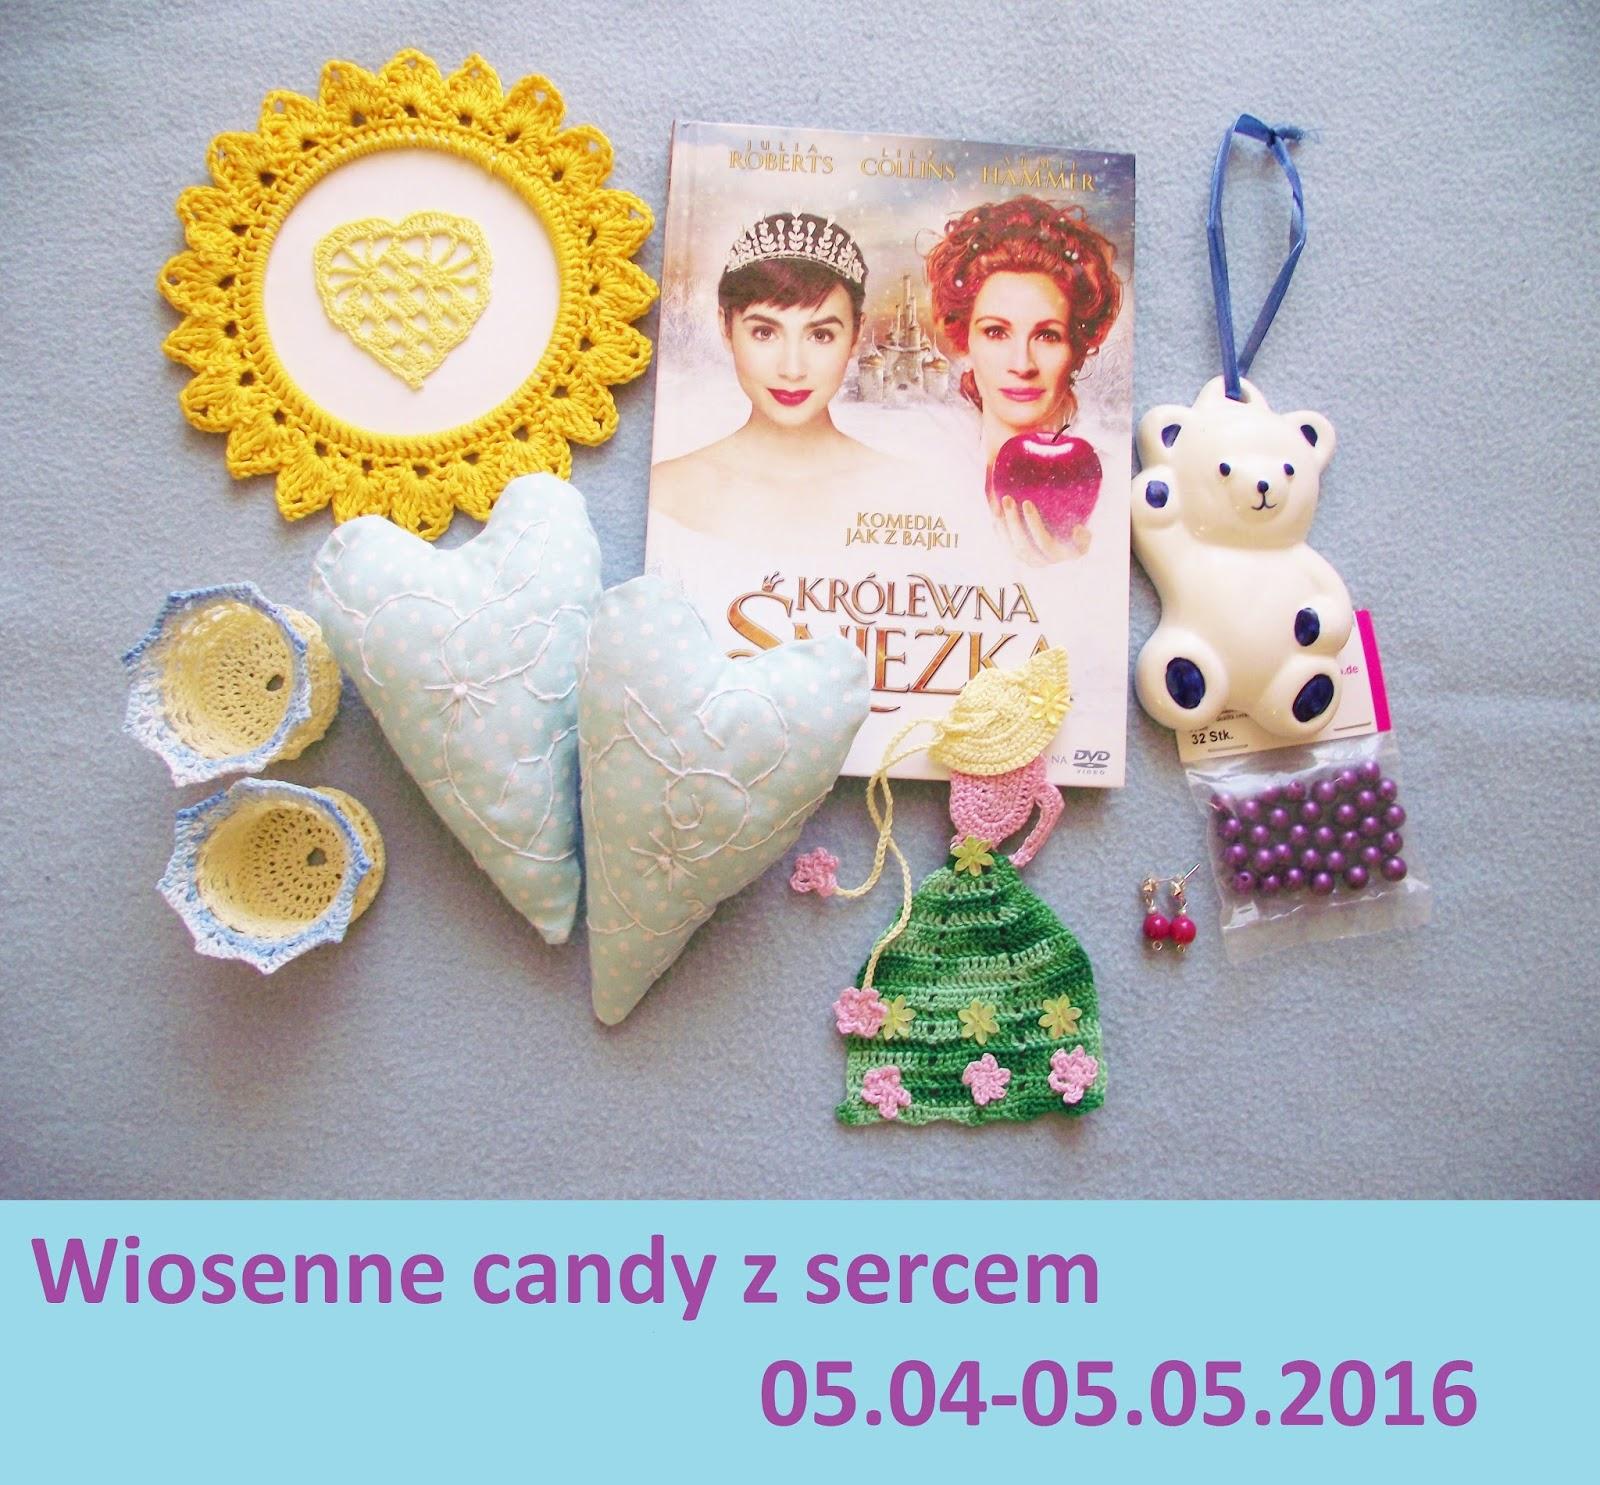 Wiosenne Candy do 5.04.